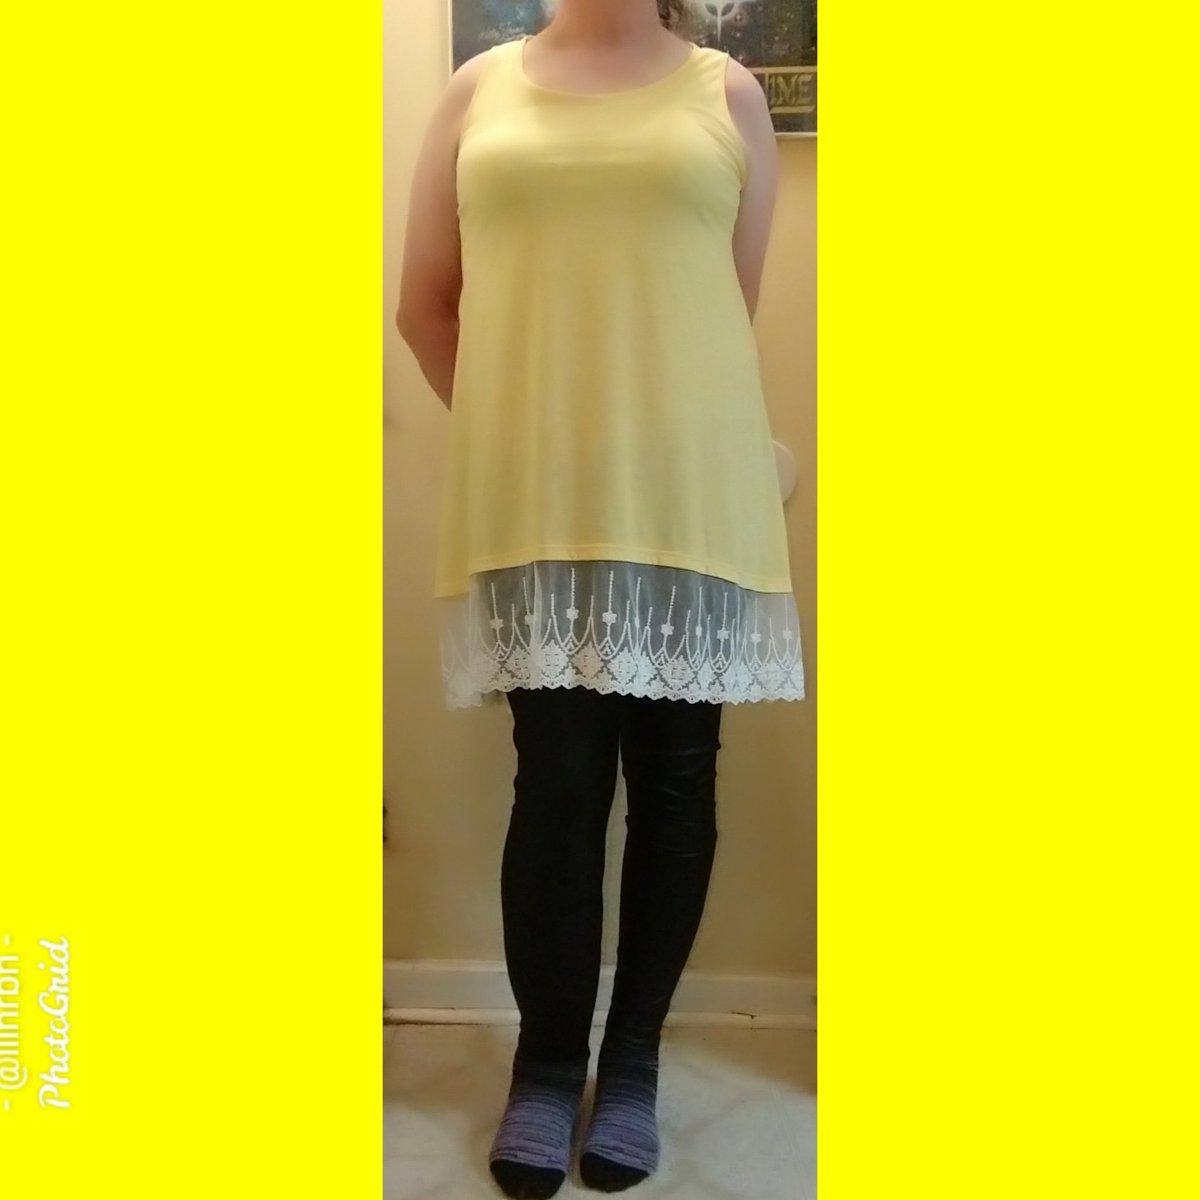 I inadvertently wore the same dress this week as I wore last Thursday.  #leggings #lillianslegs #leggingsqueen  #legsinleggings #queenofleggings #thequeenofleggings #blackleggings #legfashion #legslegslegs  #outfitoftheday #ootd #ootdfashion #ootdwomen #whatiworetodaypic.twitter.com/f946diUWjy